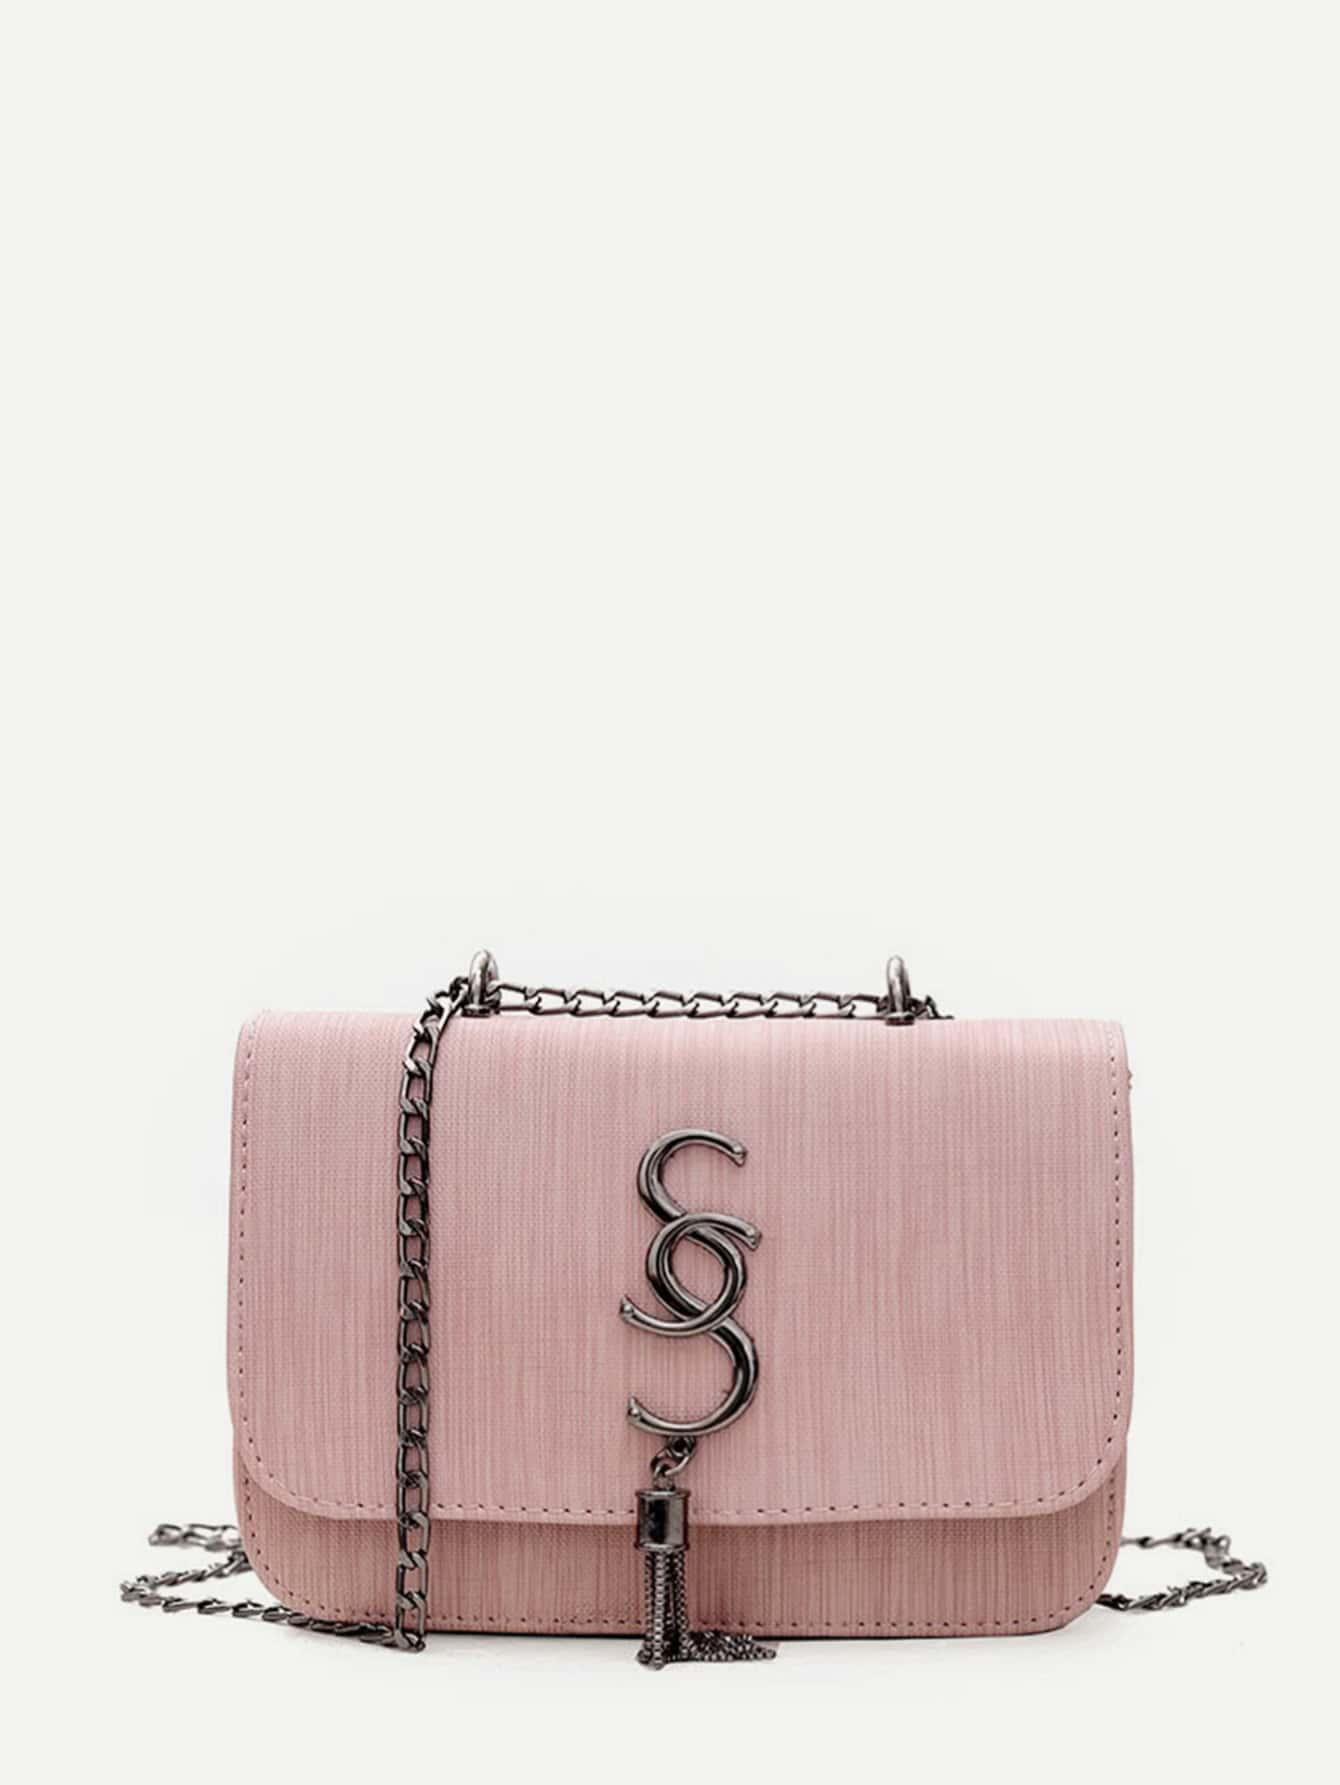 Tassel Detail PU Chain Flap Bag tassel decorated velvet chain flap bag